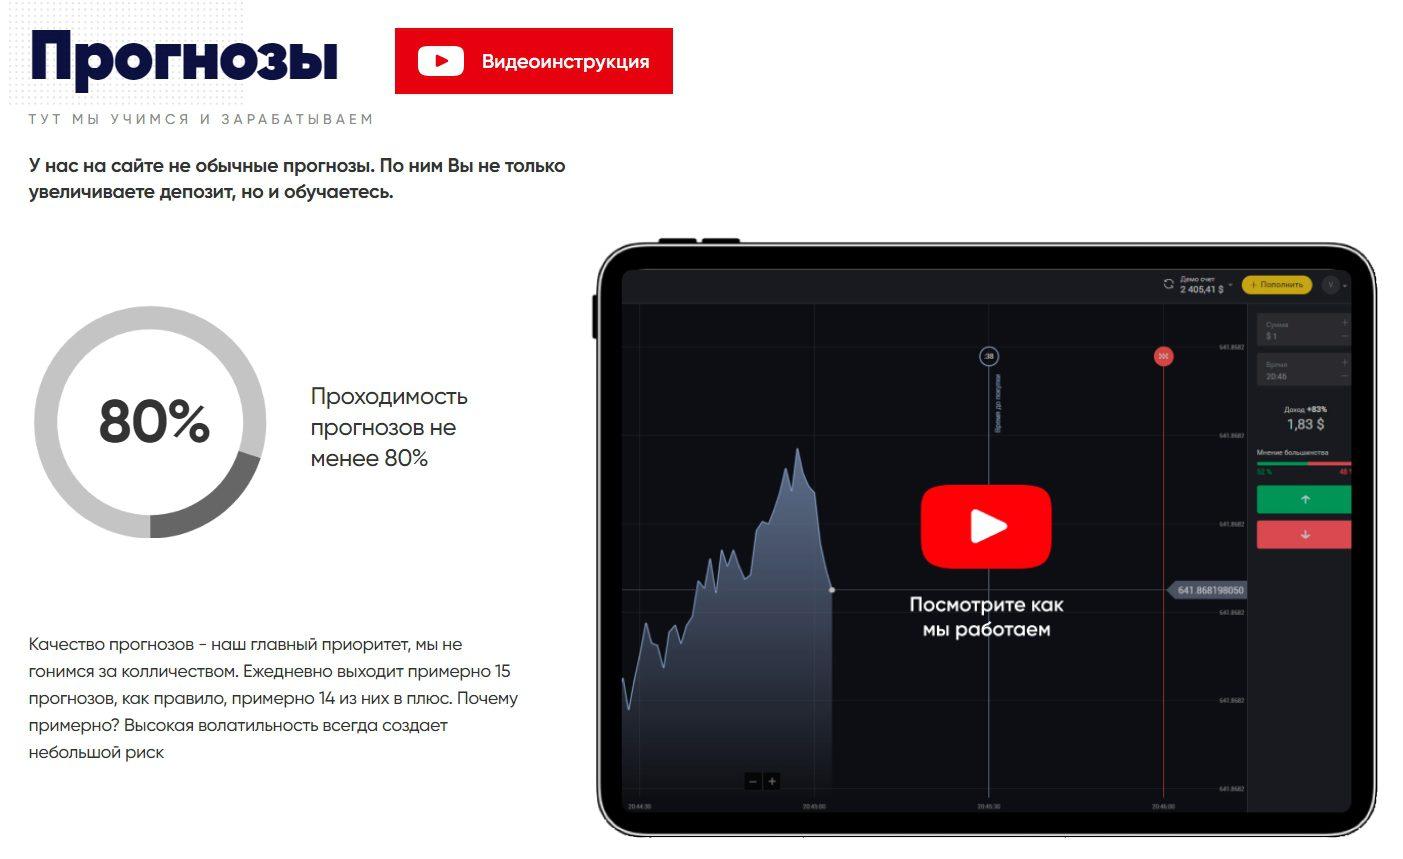 Сайт трейдера Андрея Бабенко